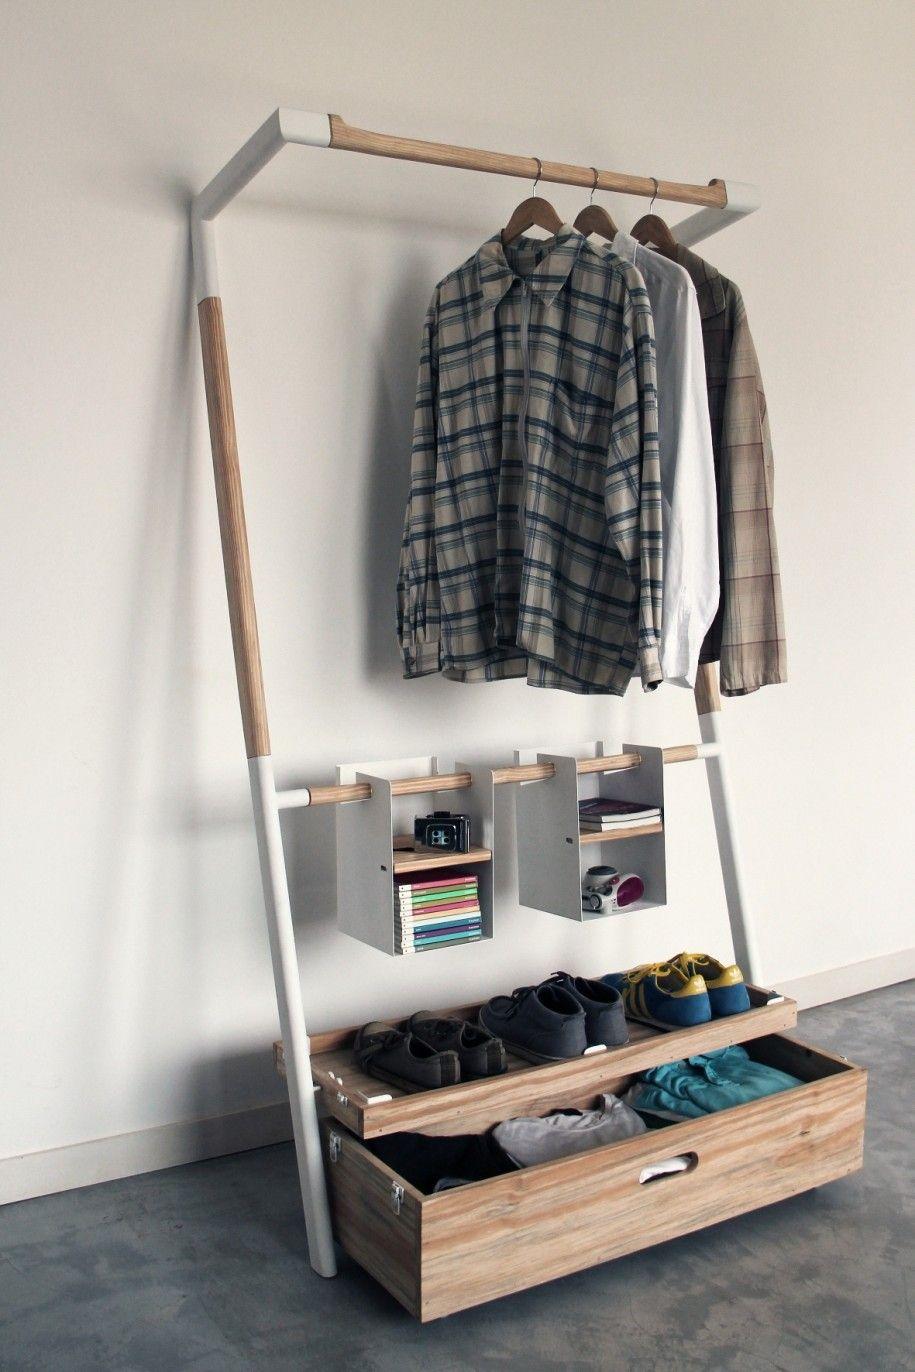 creative wooden storage woodworking furniture design clothing rh pinterest com  creative baby clothes storage